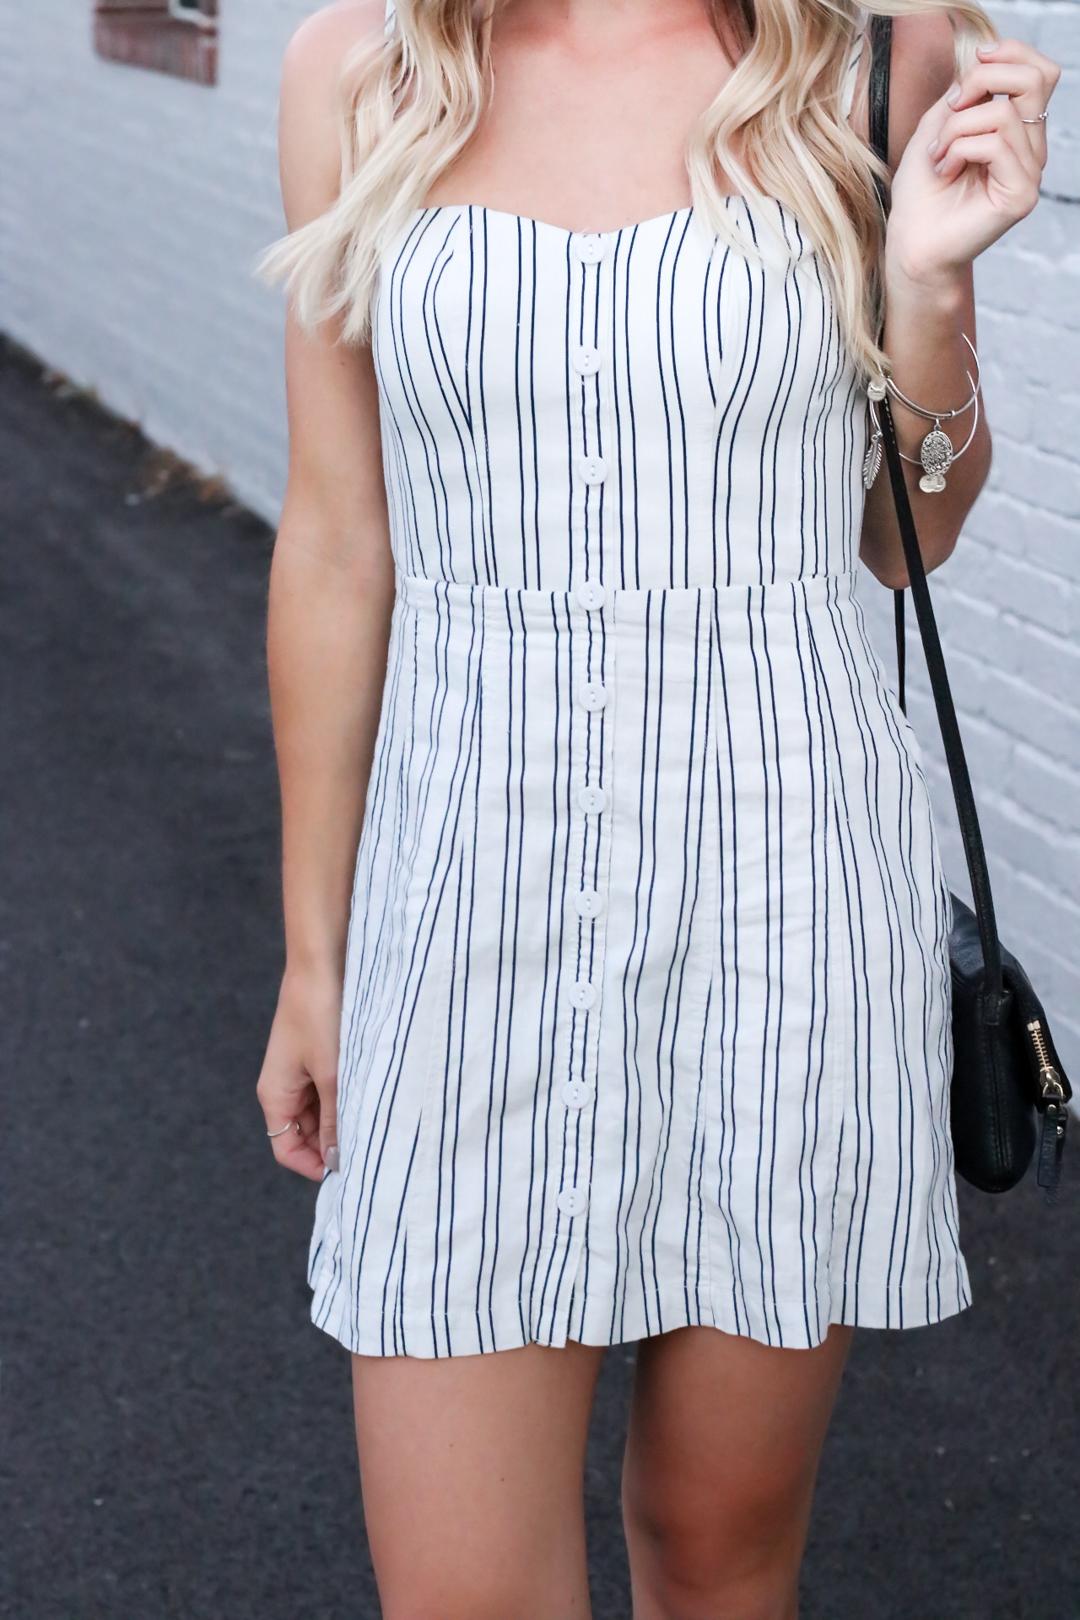 Striped Urban Outfitters Mini Dress-6.jpg